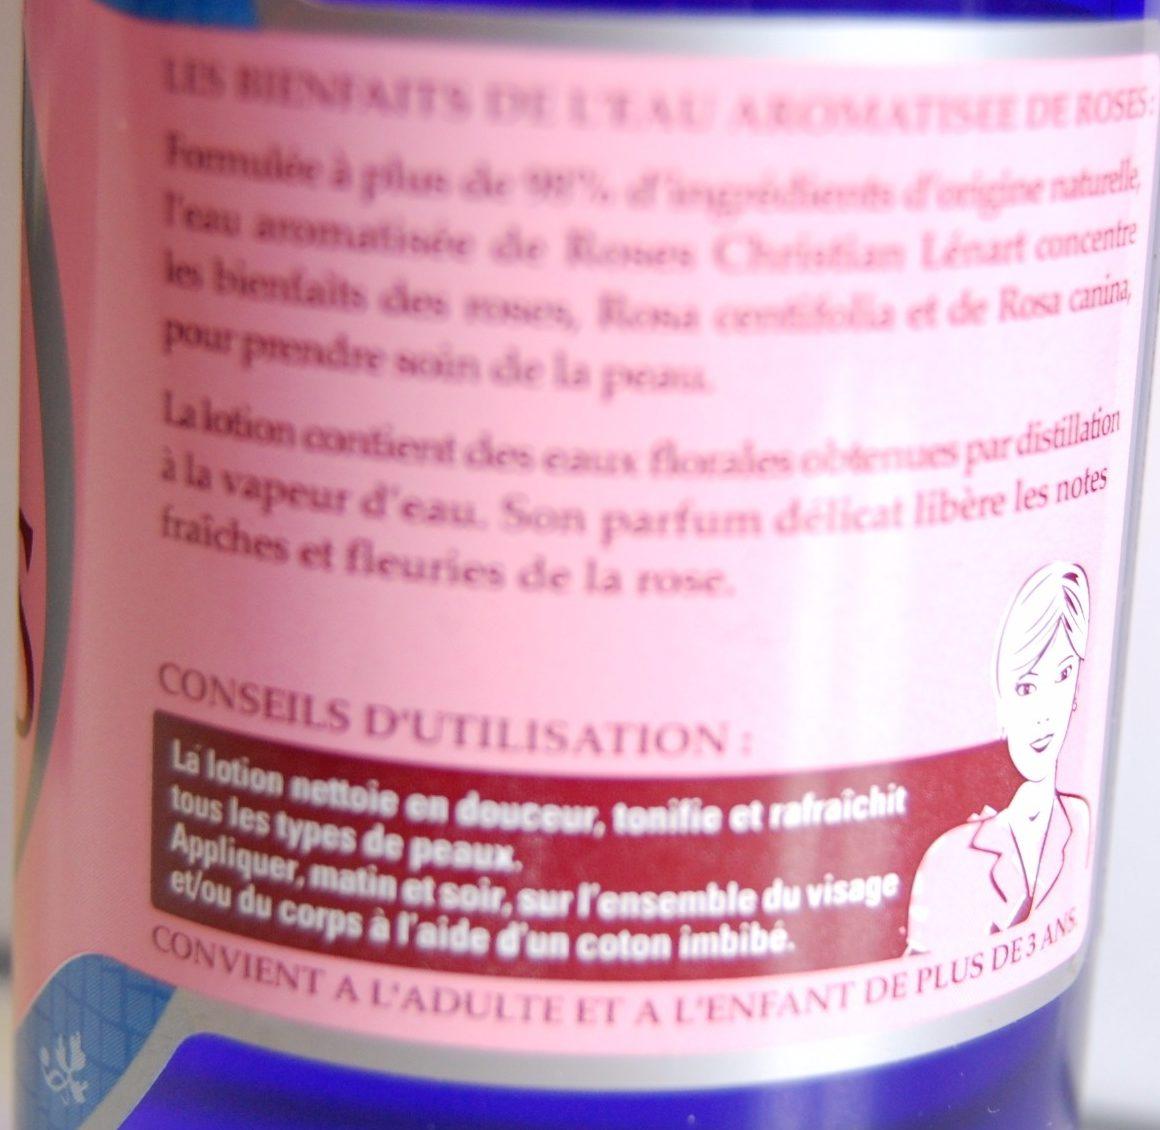 Eau de roses aromatisée - Ingredients